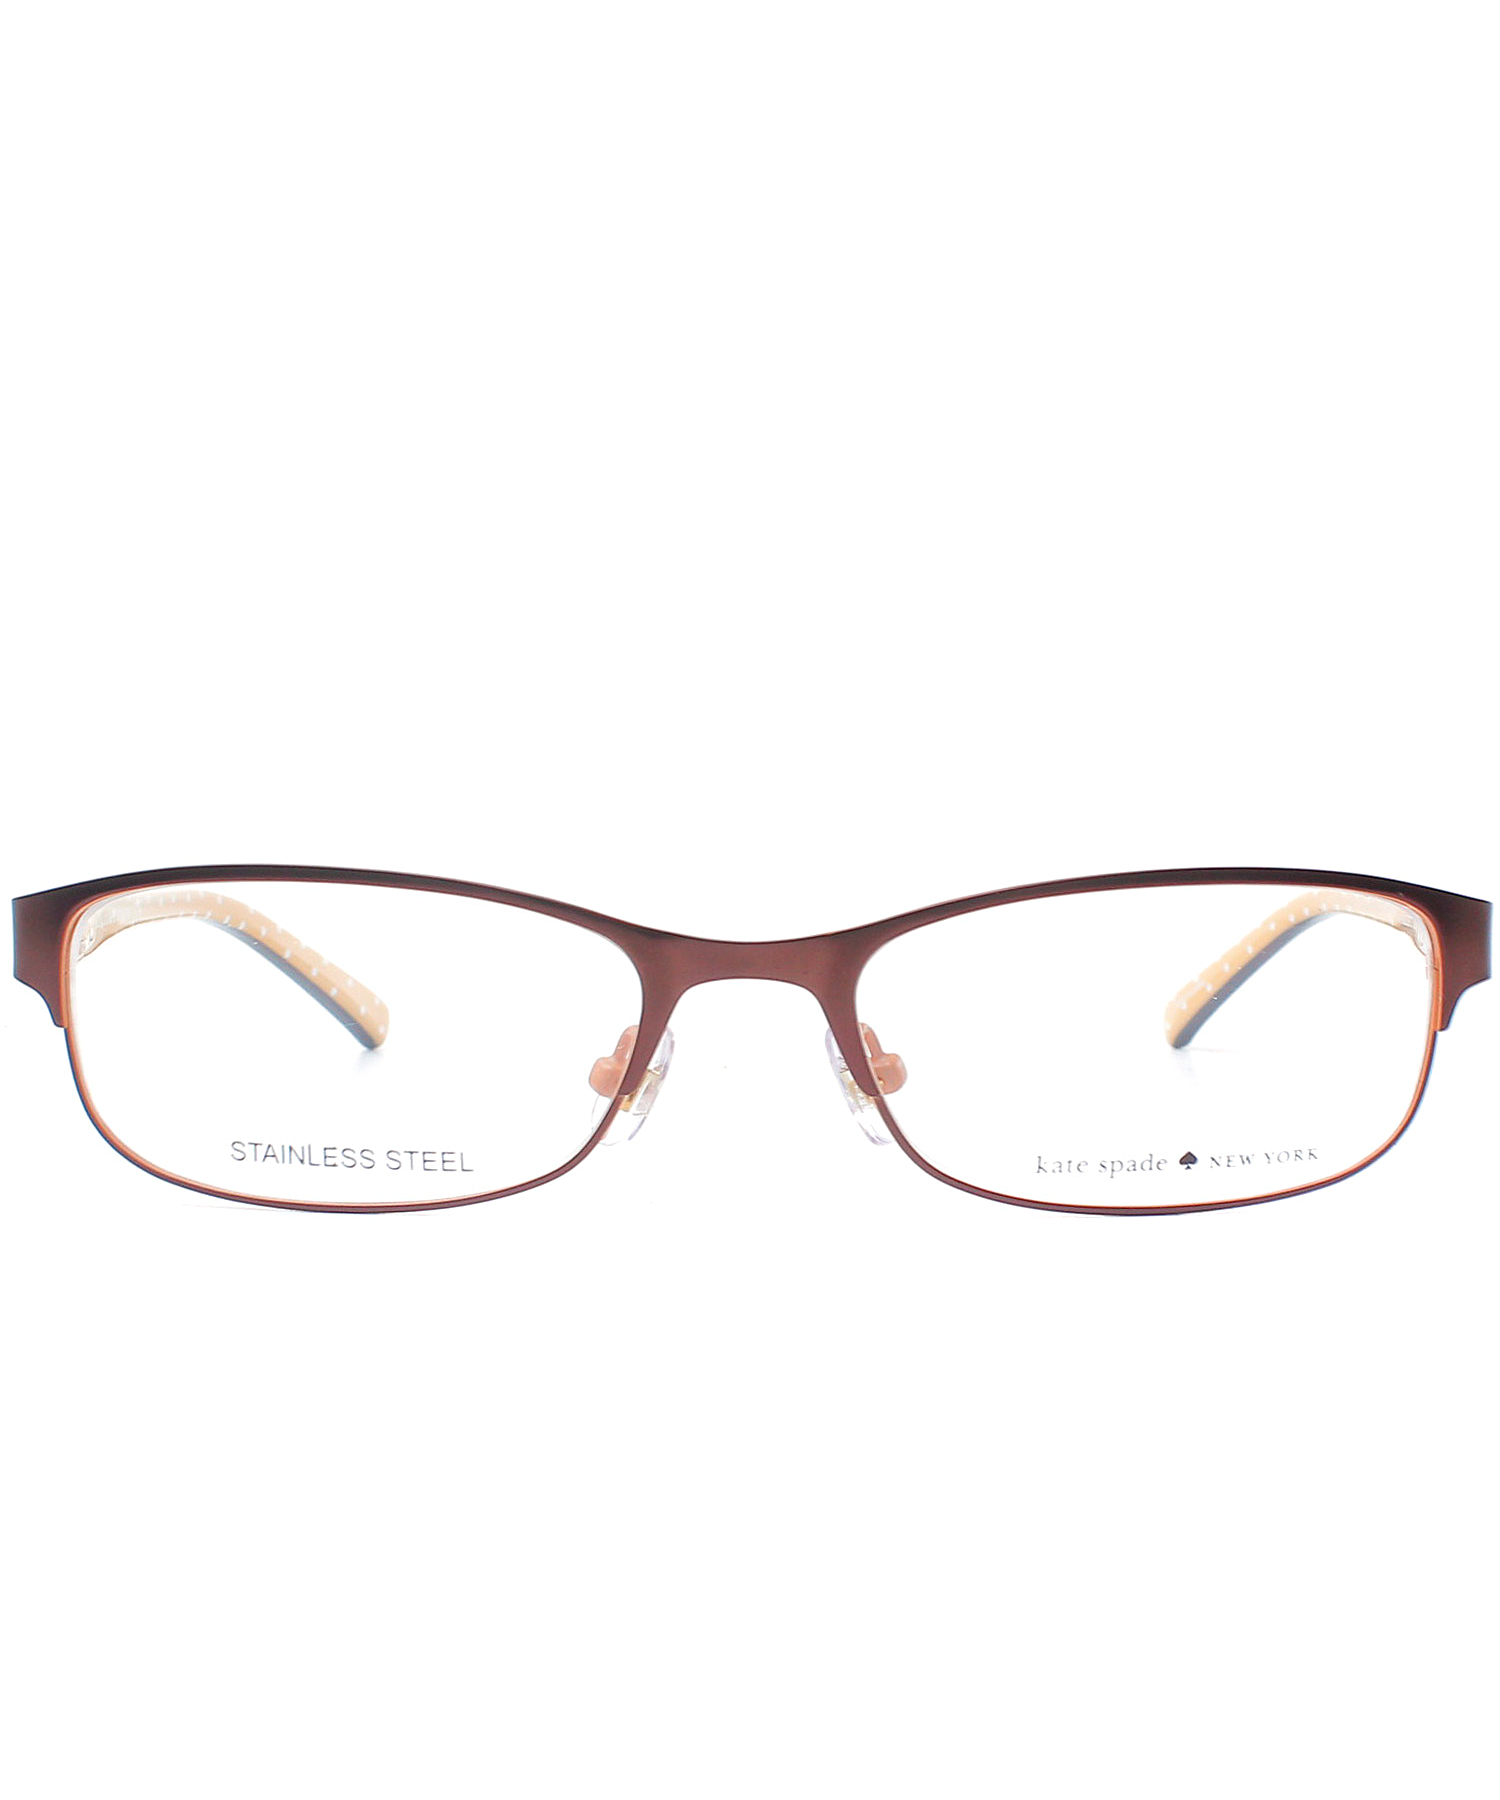 Kate Spade New York Eyeglass Frames : Kate spade new york Rectangle Metal Eyeglasses in Black Lyst